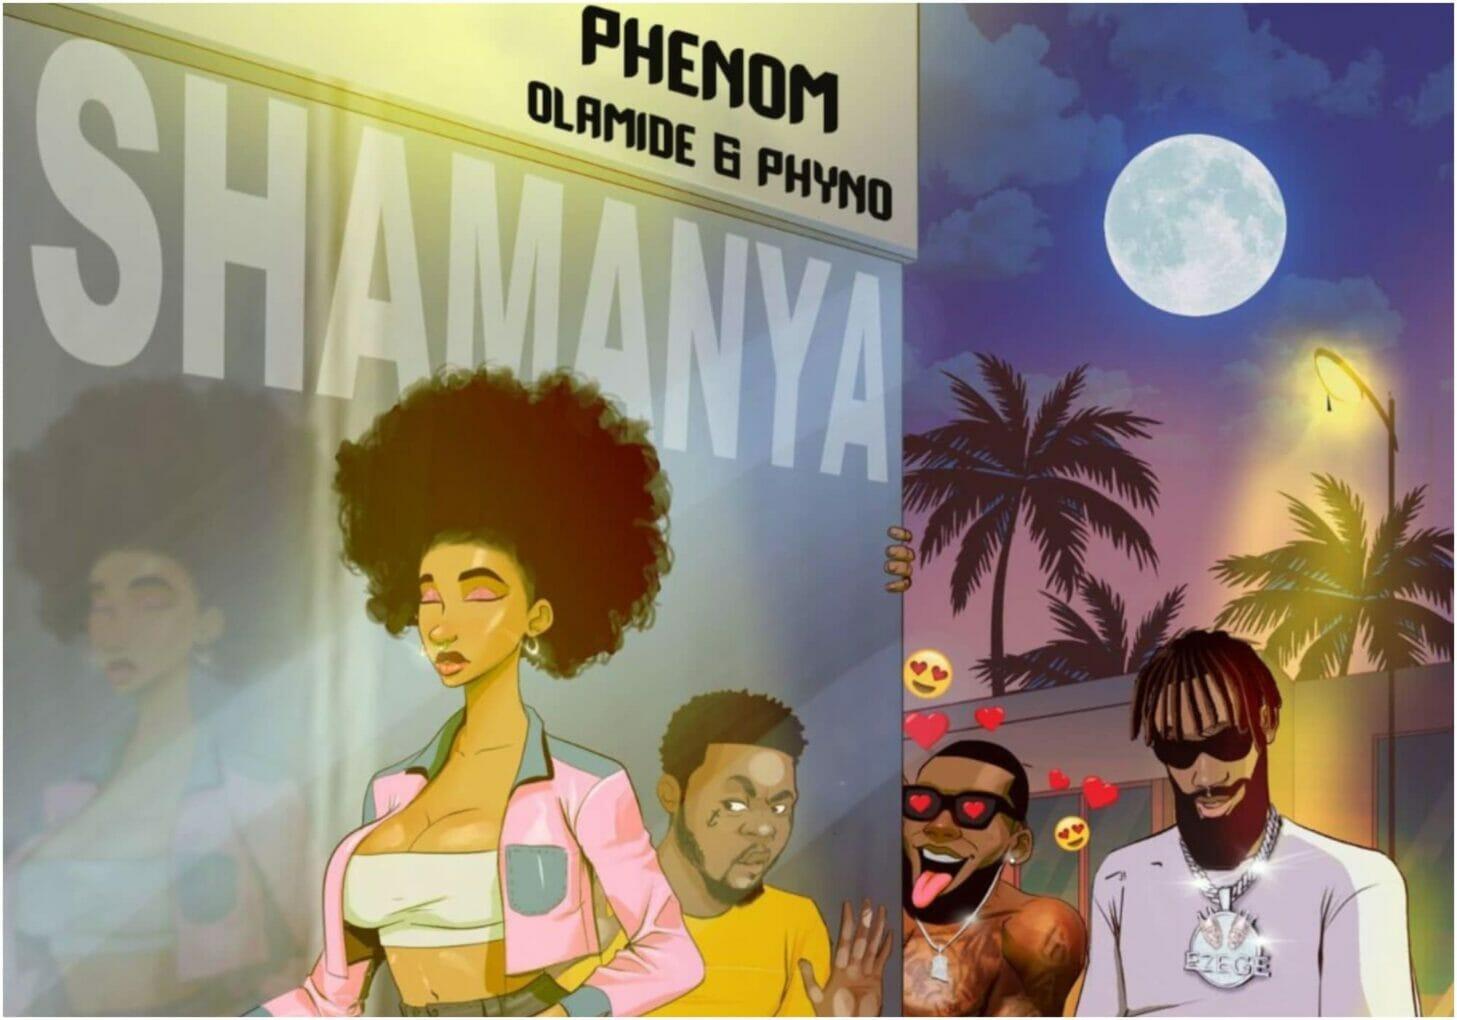 Phenom ft. Olamide & Phyno – Shamanya